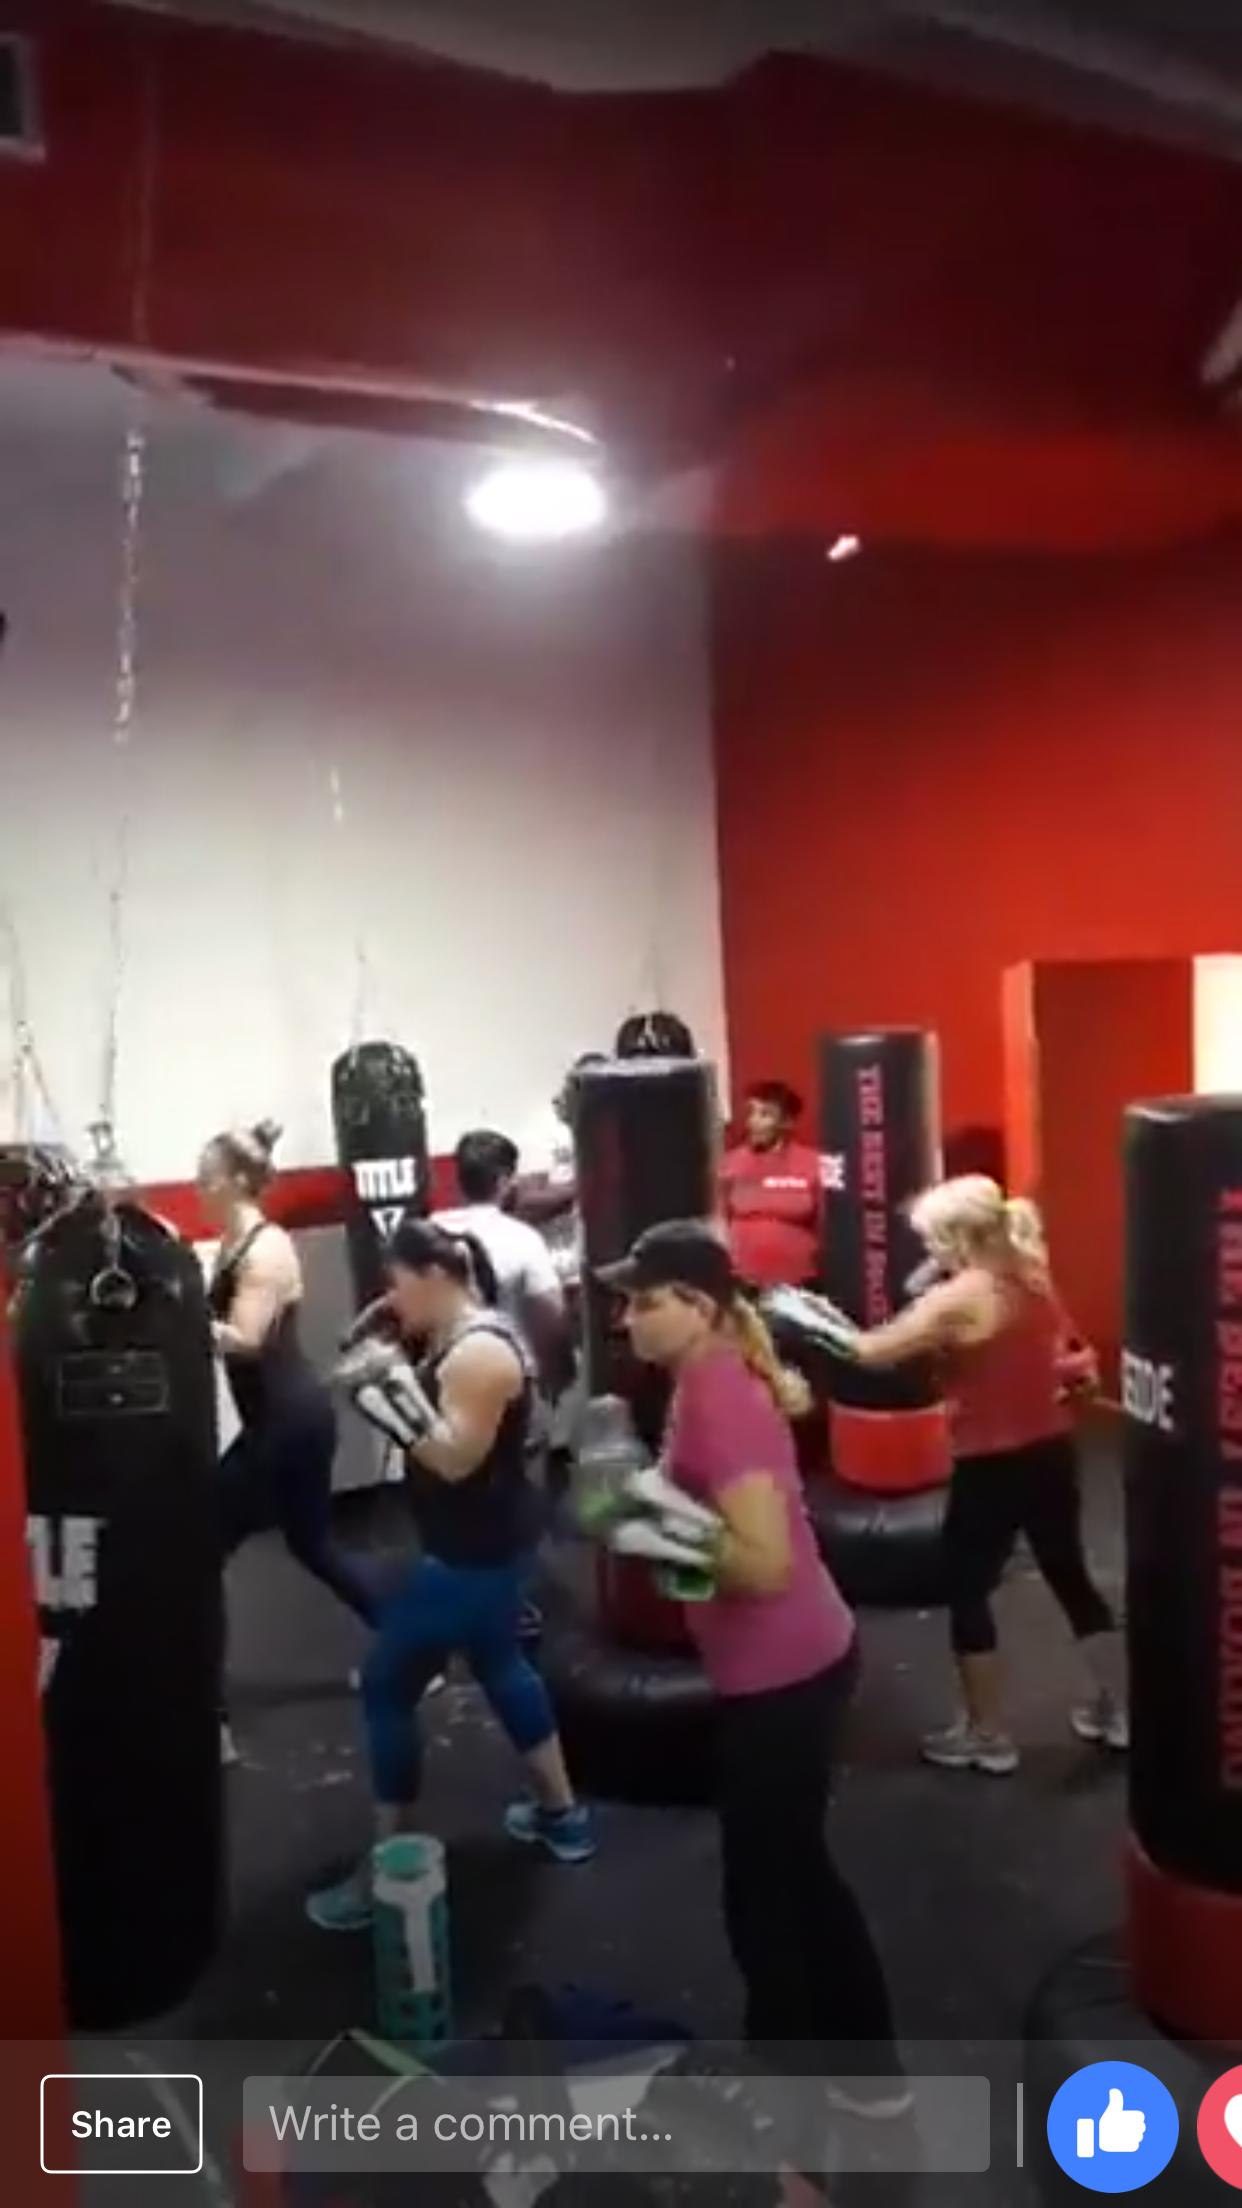 https://0201.nccdn.net/1_2/000/000/0b8/4fe/boxing-bags.png